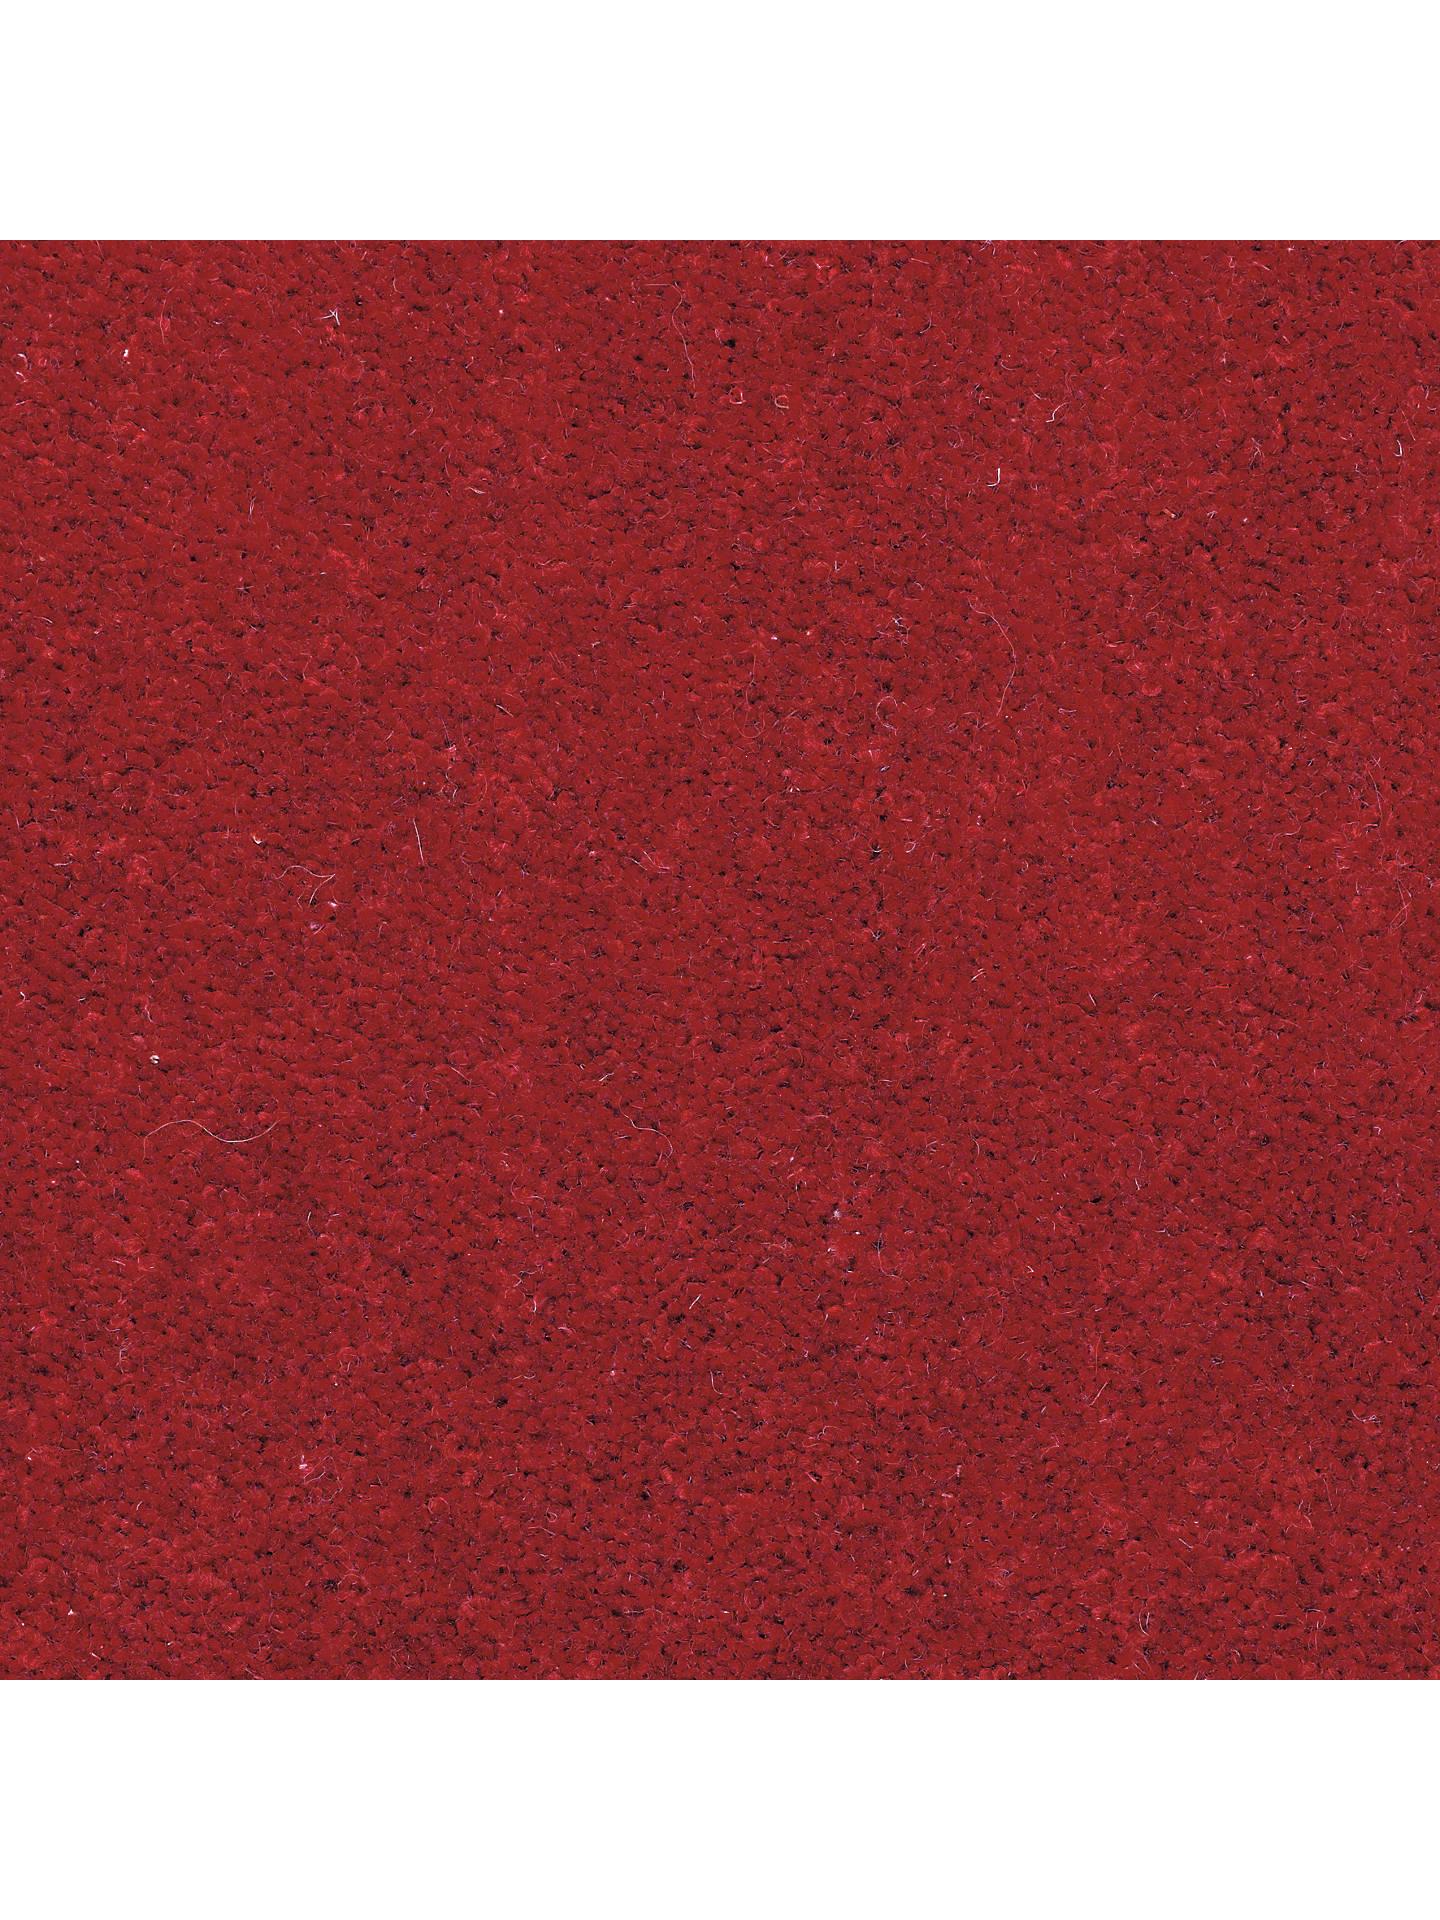 john lewis new zealand wool rich plain twist 60oz carpet. Black Bedroom Furniture Sets. Home Design Ideas